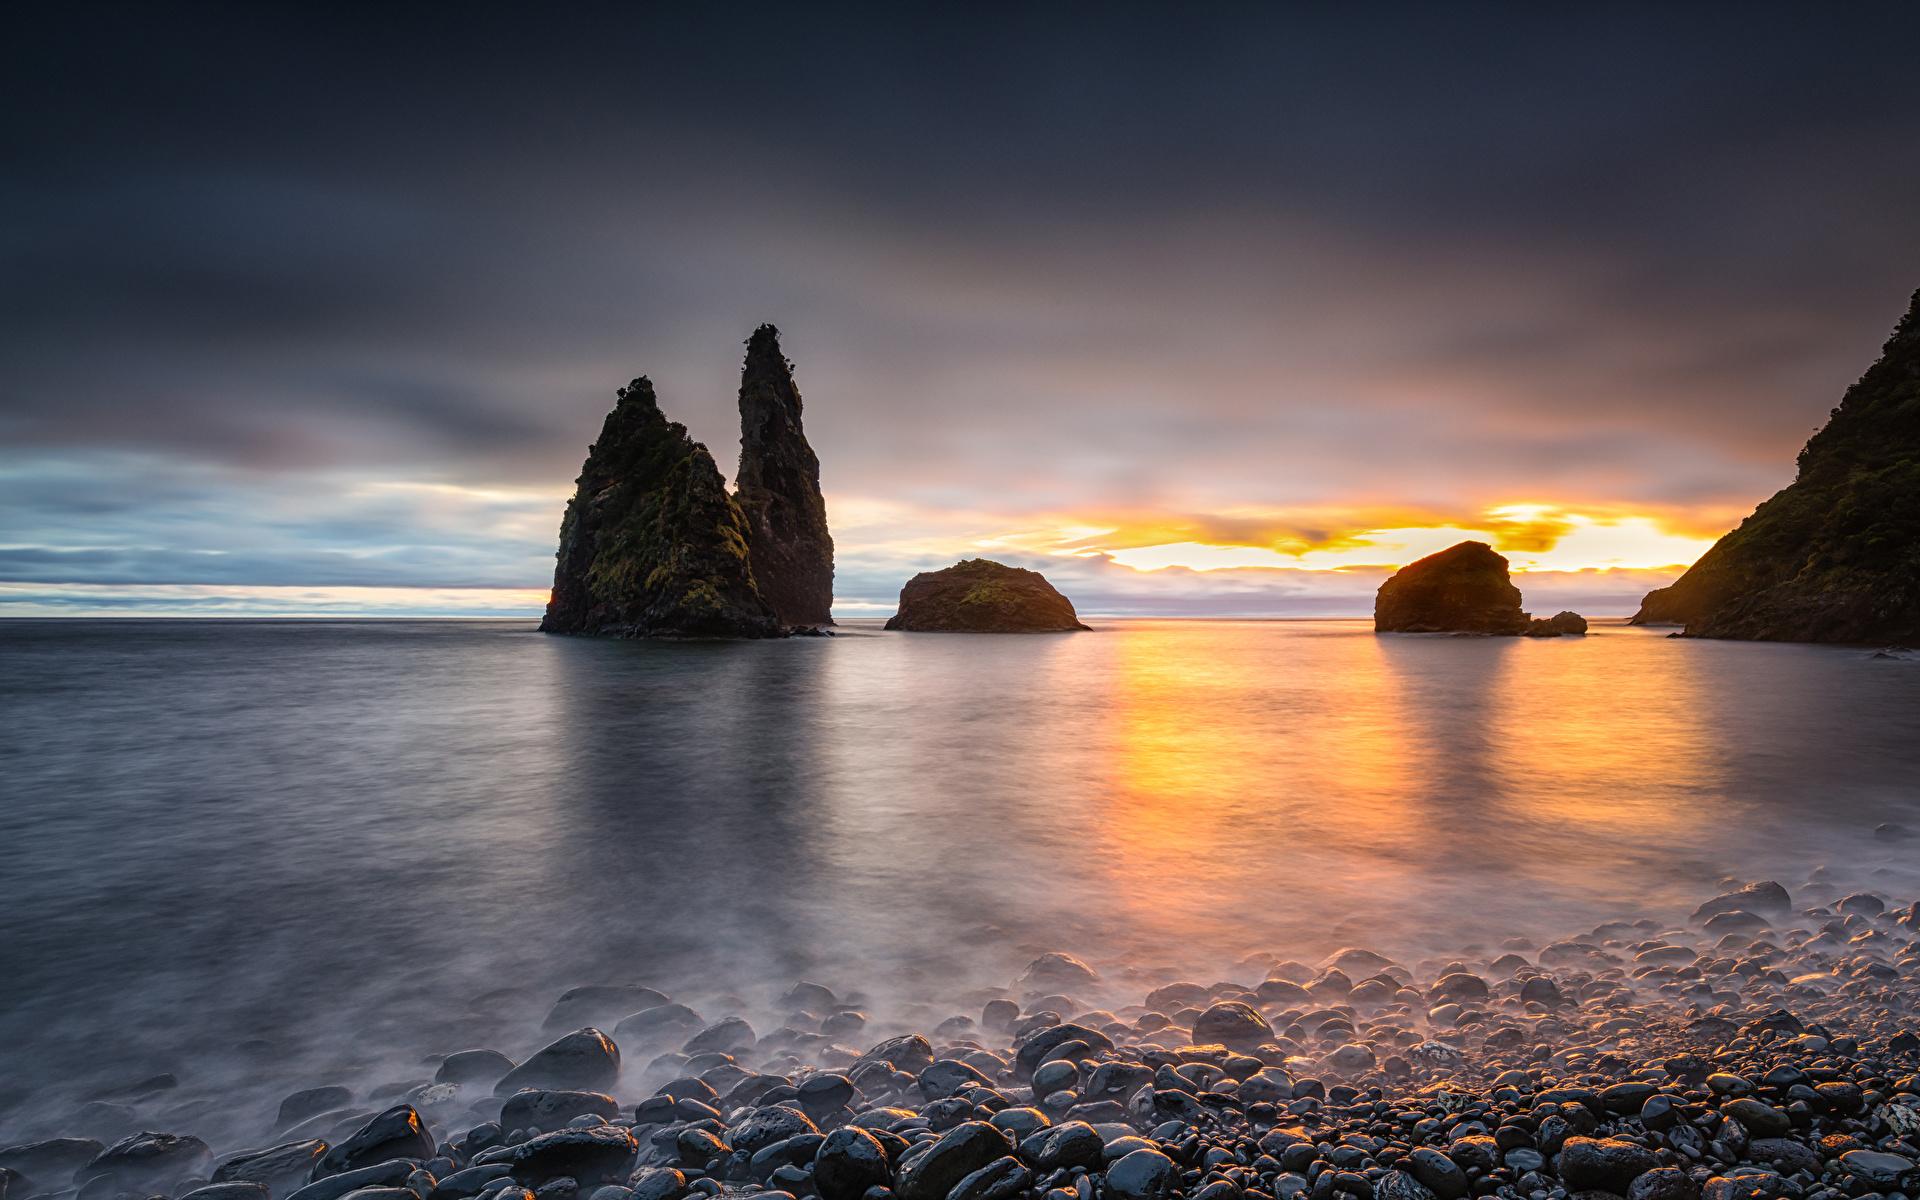 Photo Portugal Alagoa Crag Nature Sunrises and sunsets Bay Coast stone 1920x1200 Rock Cliff sunrise and sunset Stones